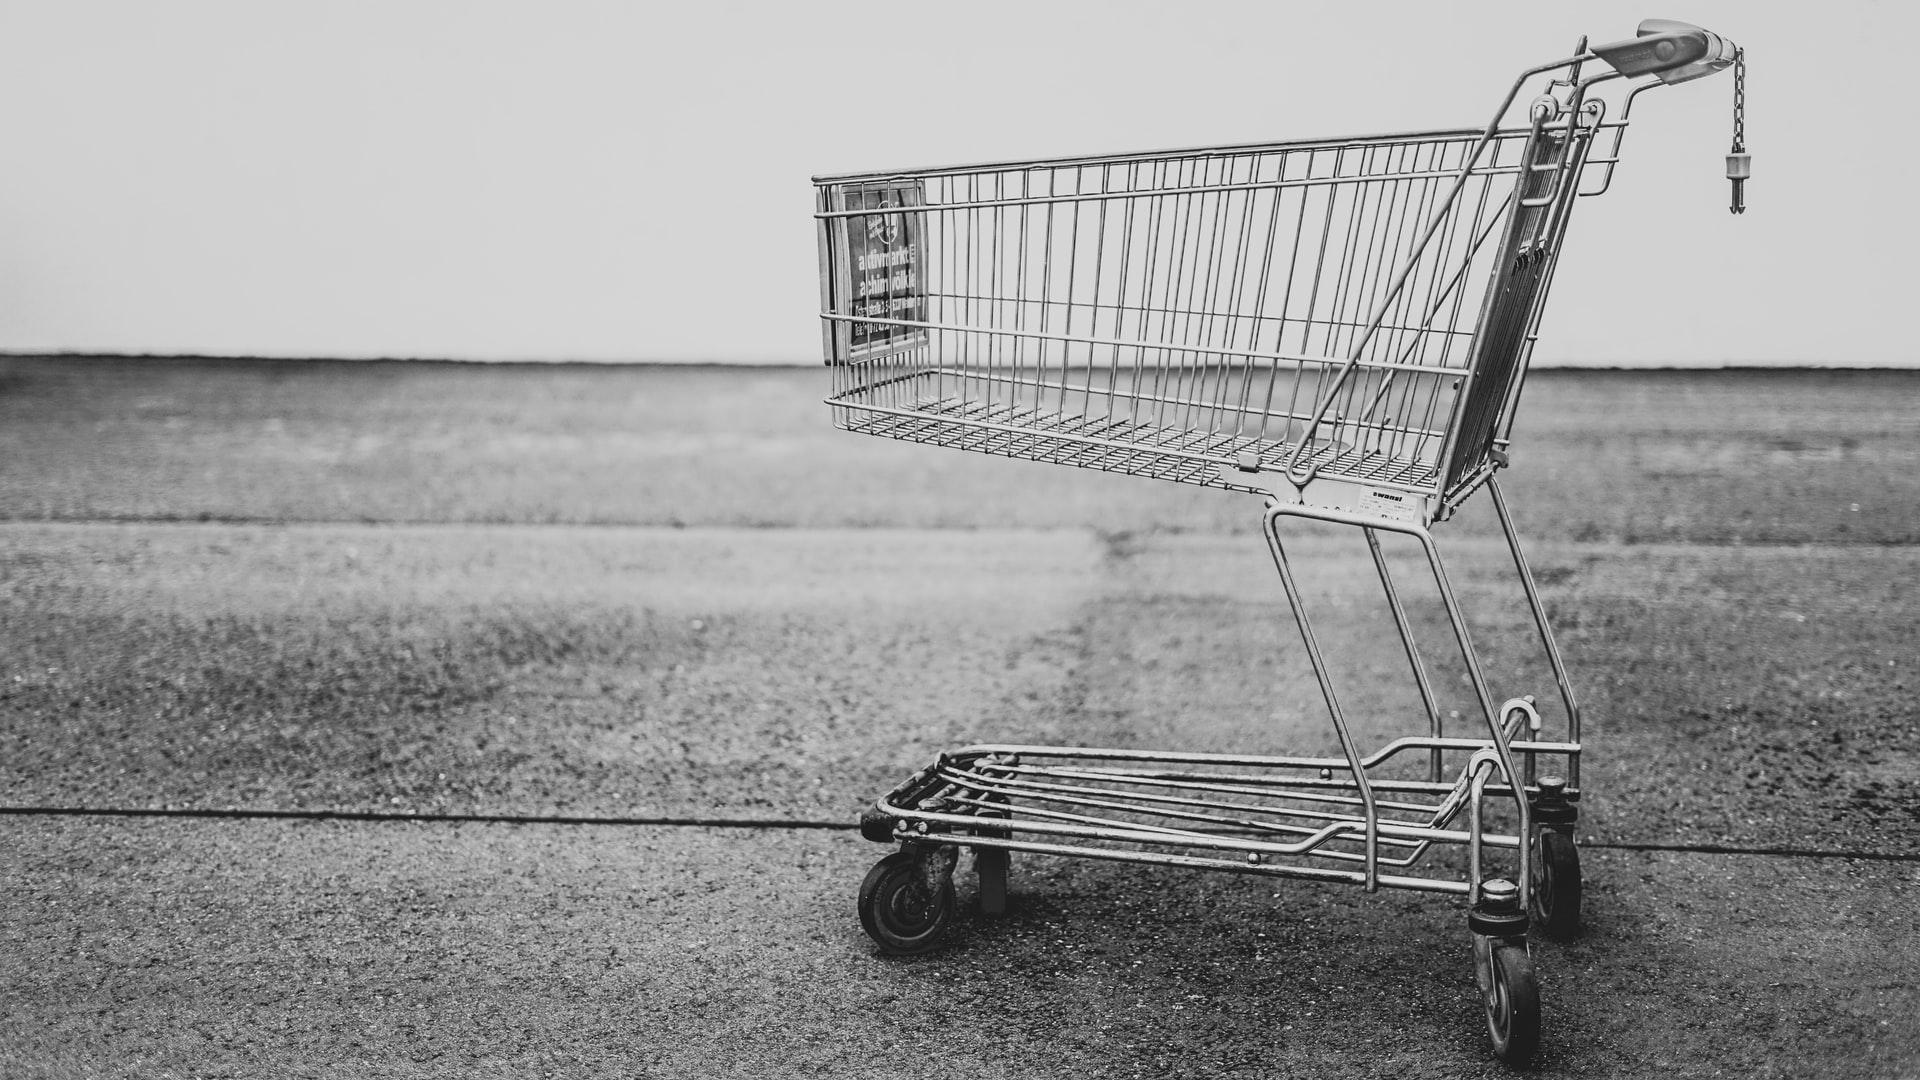 Empty shopping cart / Unsplash-Bruno Kelzer